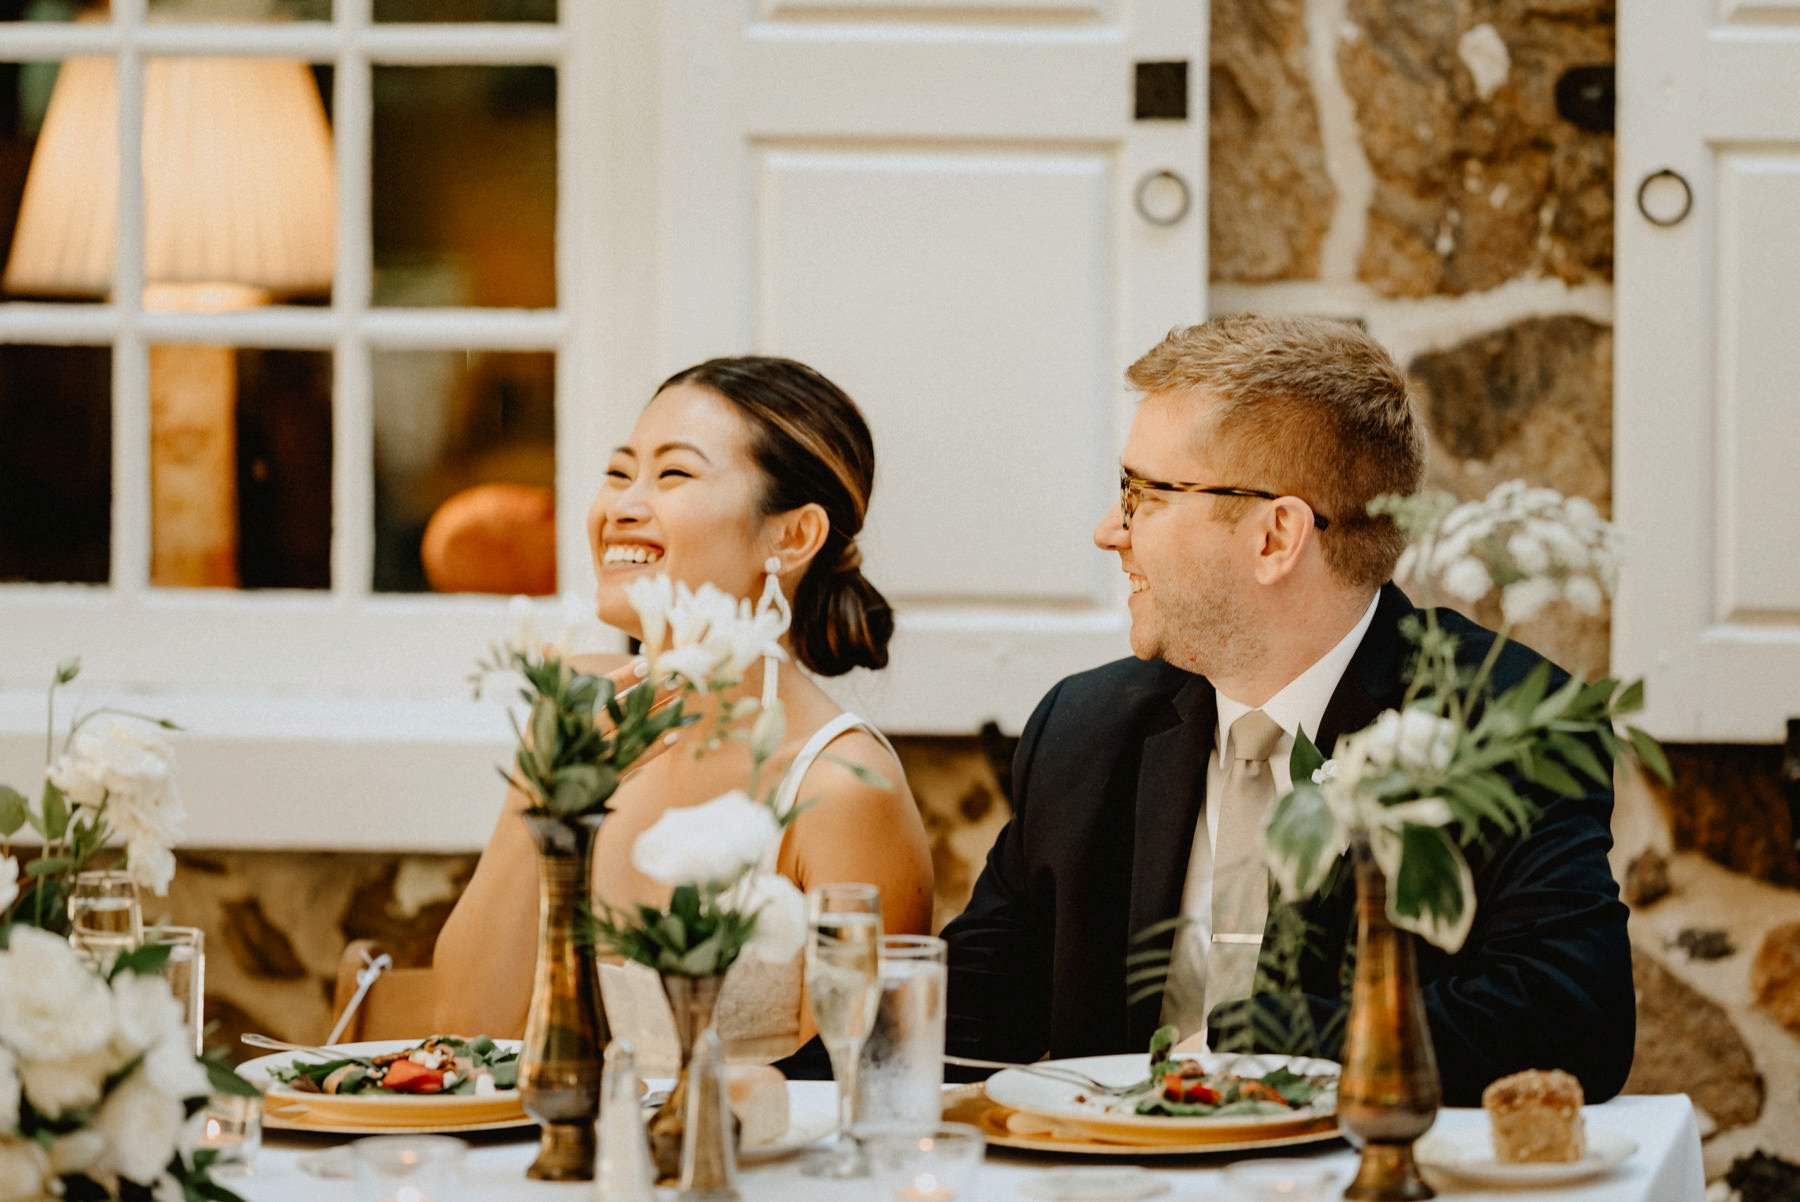 Appleford-estate-wedding-120.jpg